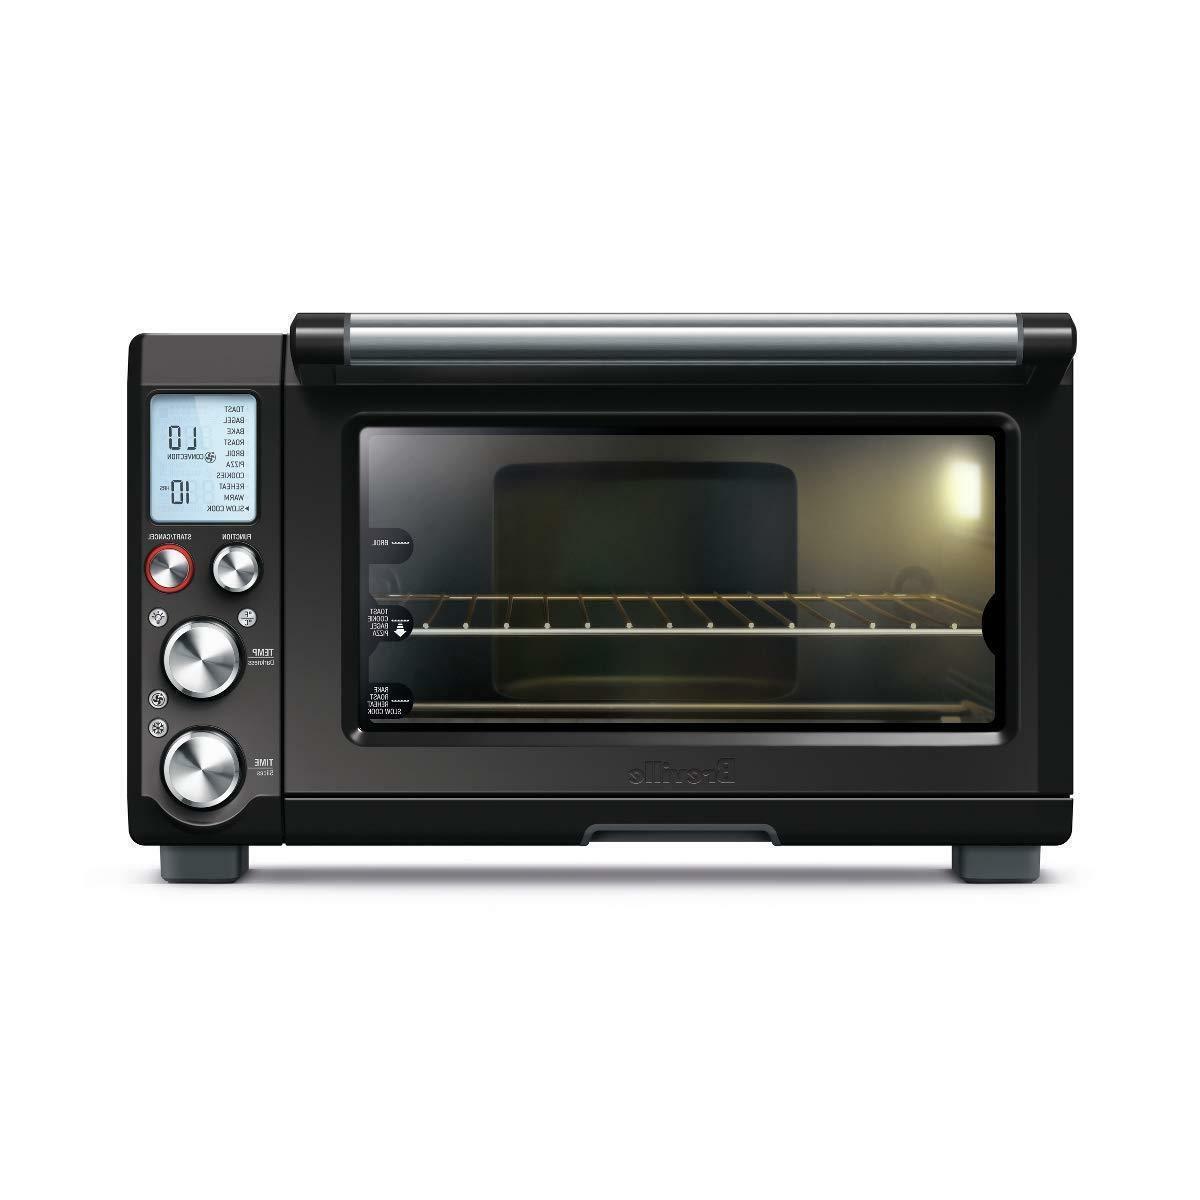 bov845bks the smart oven pro 110 volts